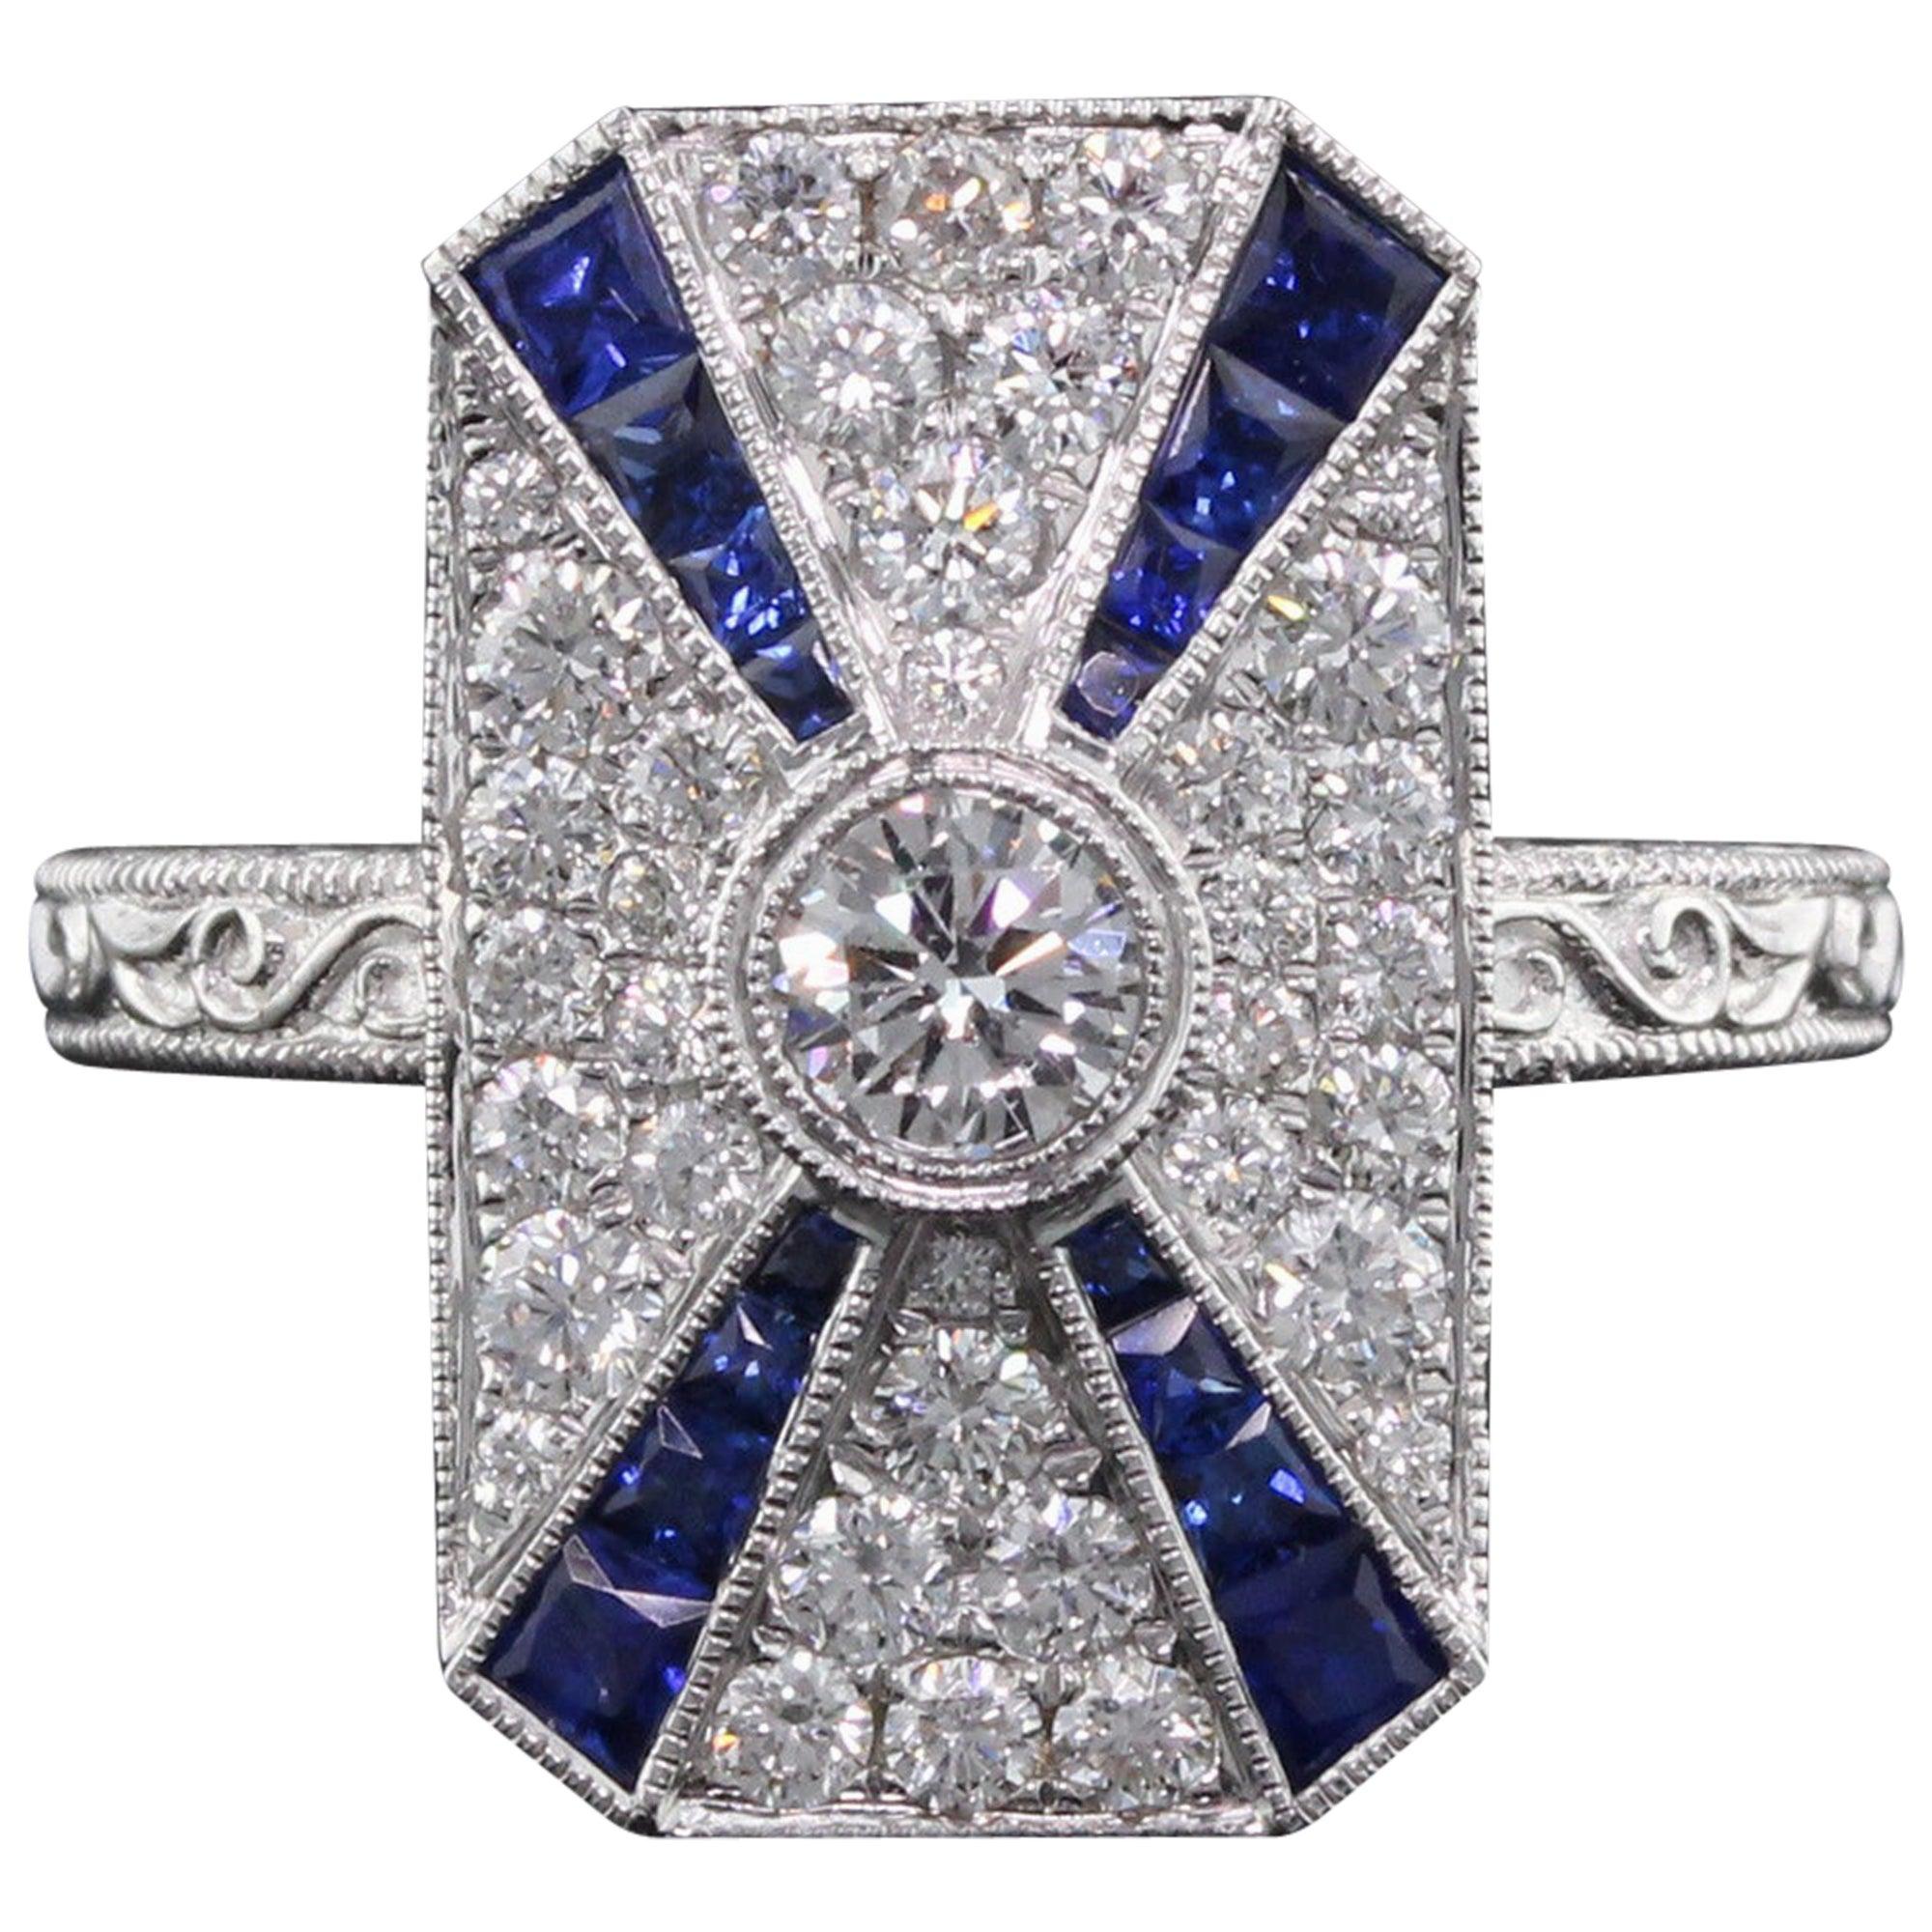 Art Deco Inspired 18 Karat White Gold Sapphire and Diamond Ring